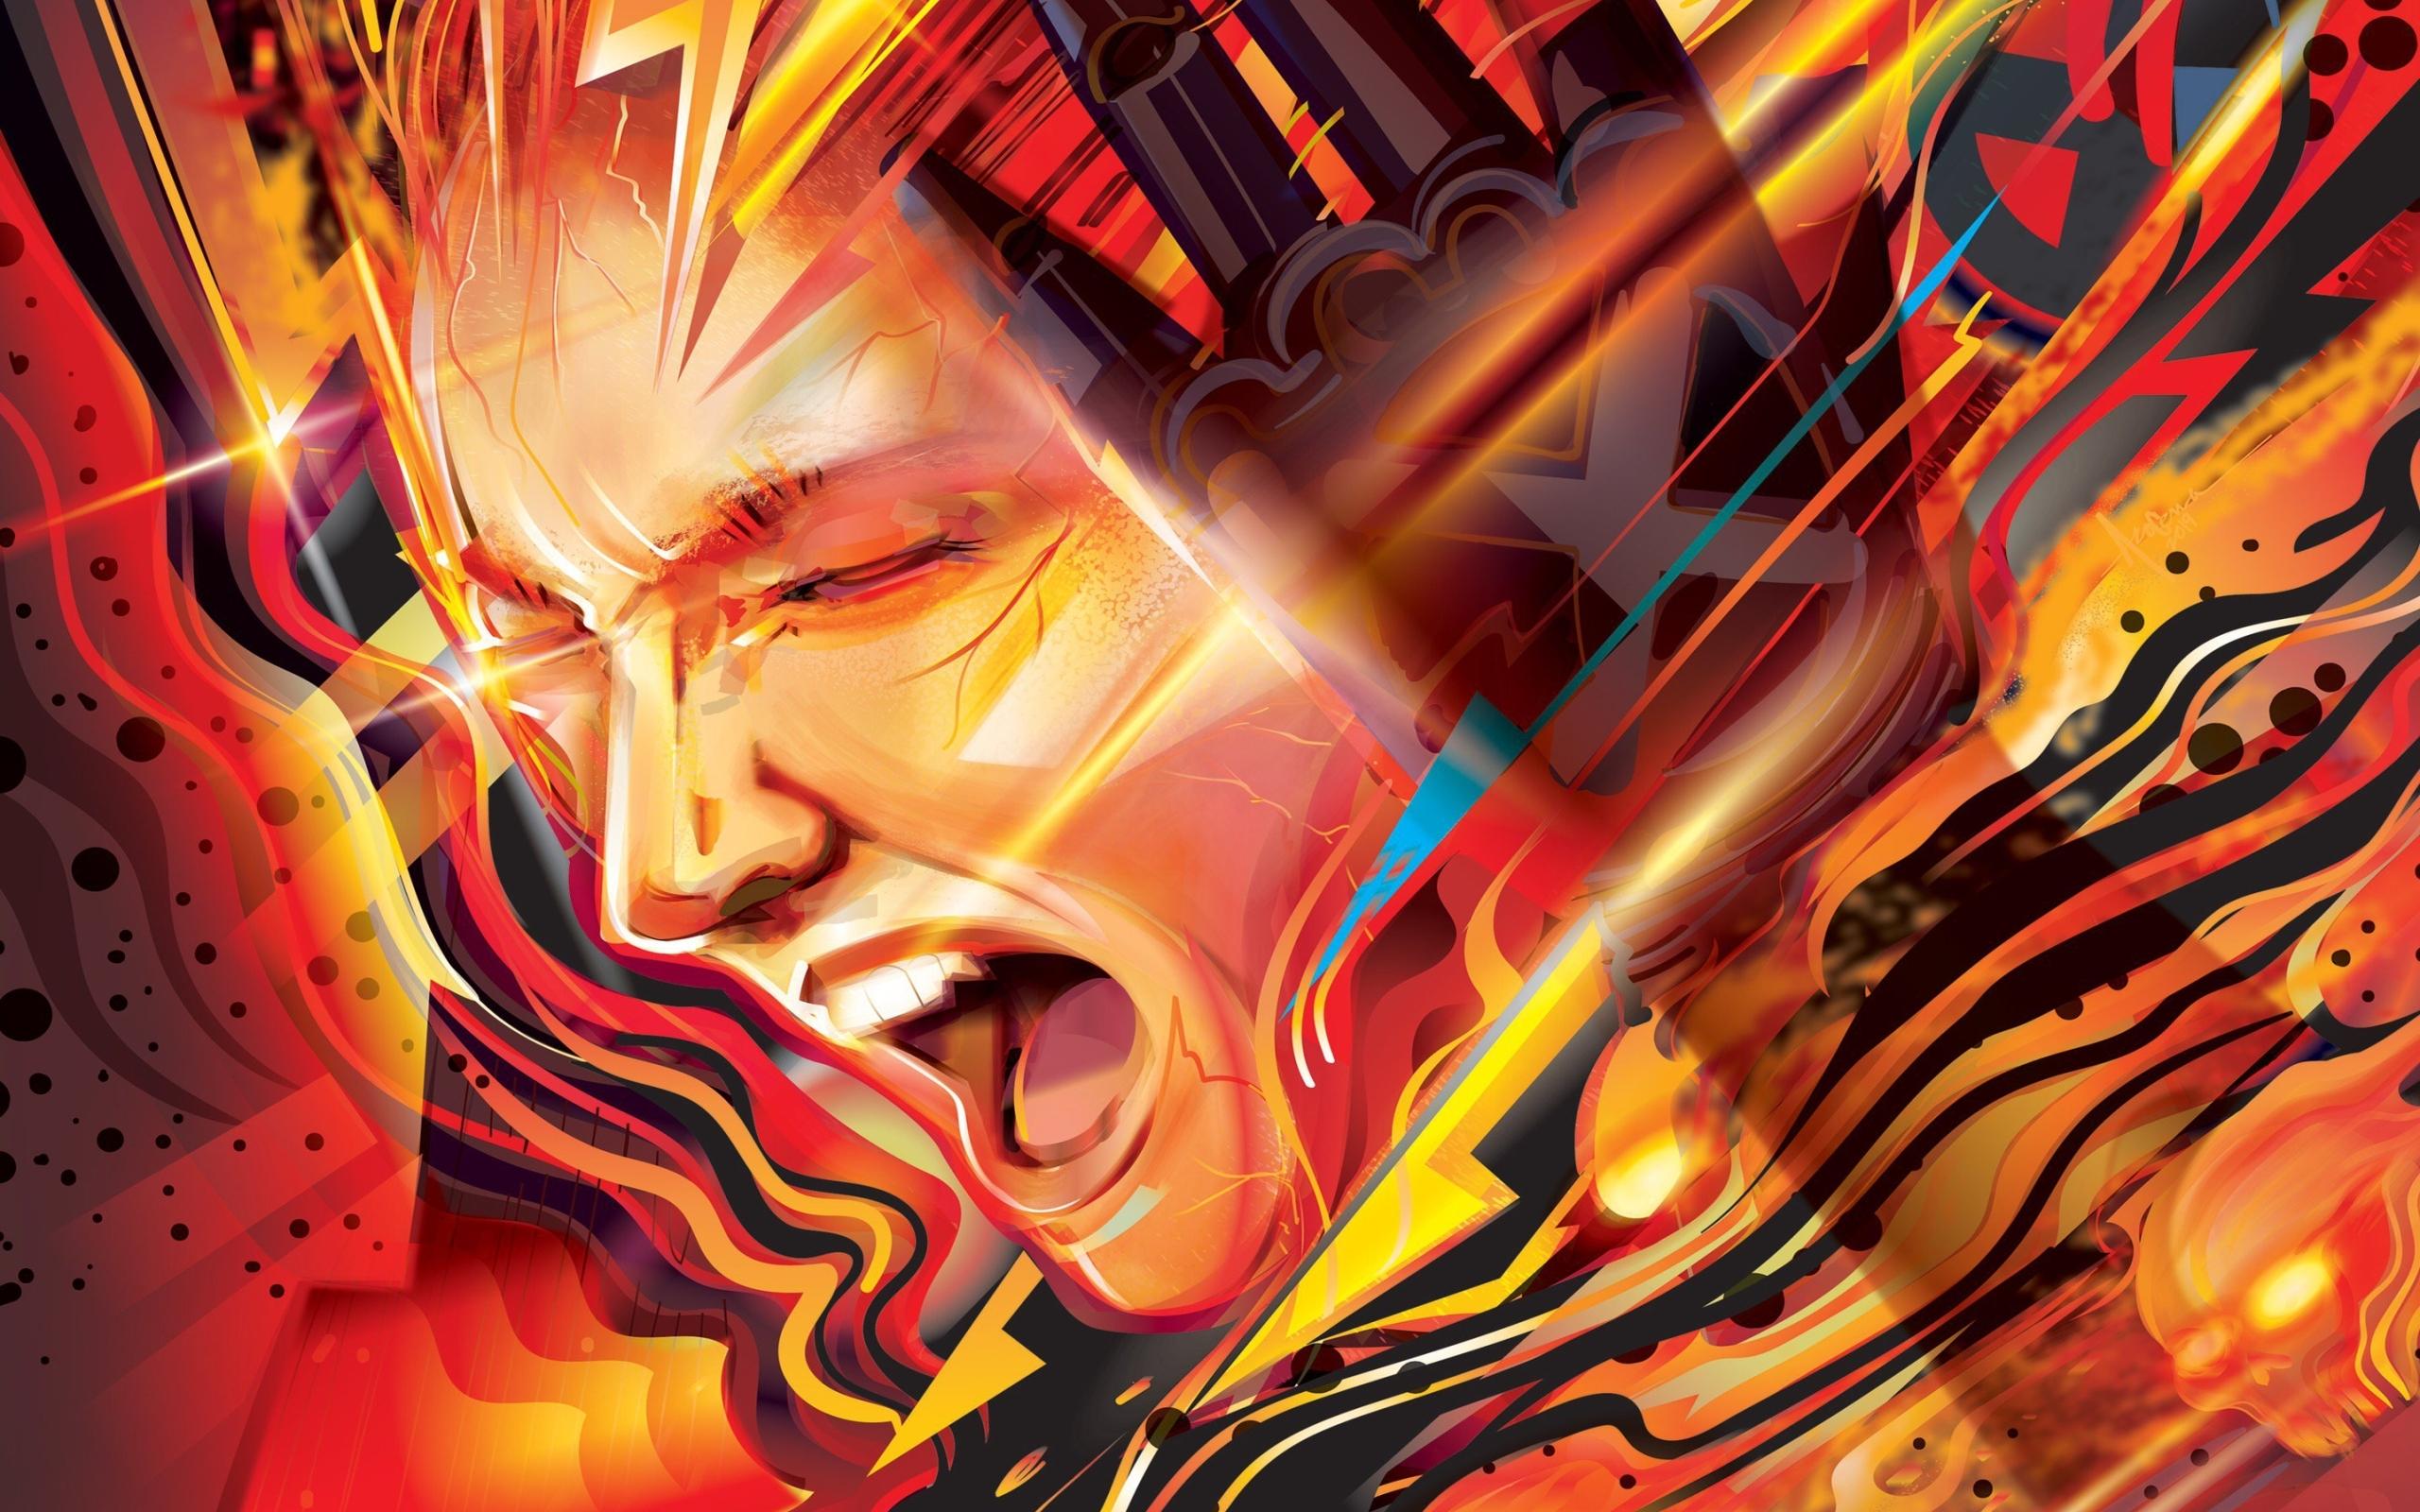 2560x1600 Dark Phoenix 2019 X Men Textless Poster 2560x1600